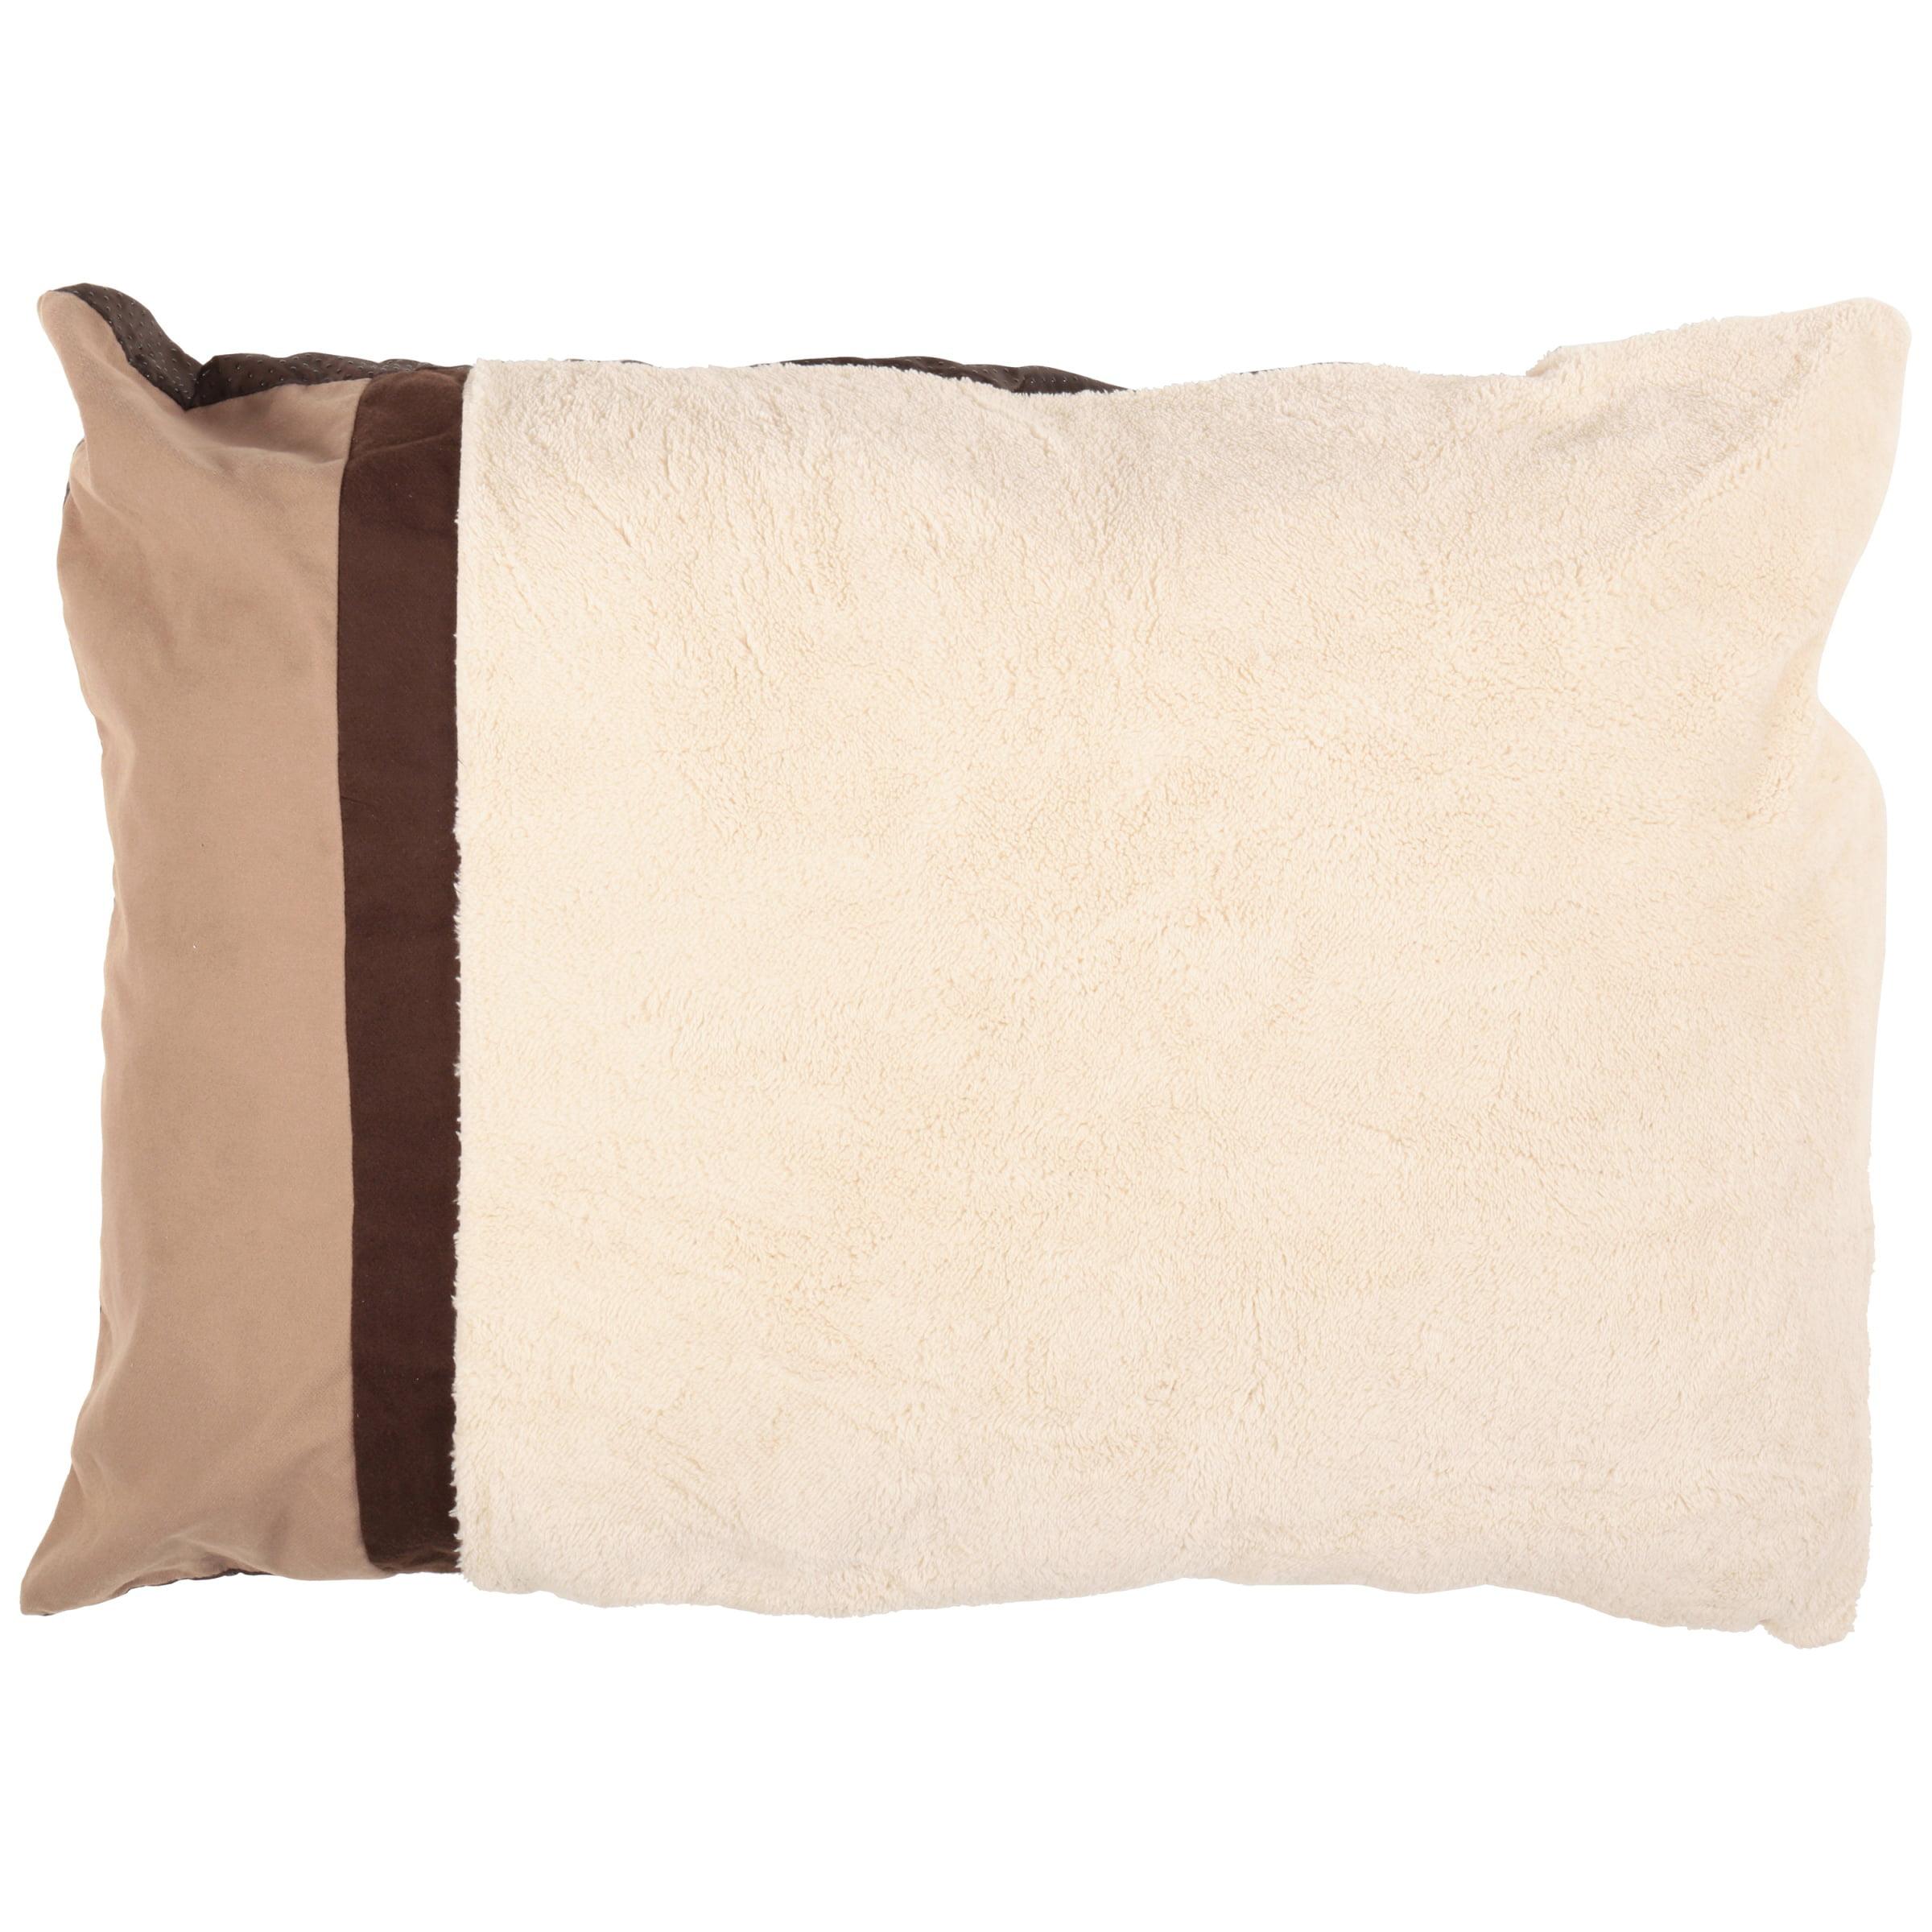 "Aspen Pet Classic Pillow Dog Bed, Brown, 27""L x 36""W"